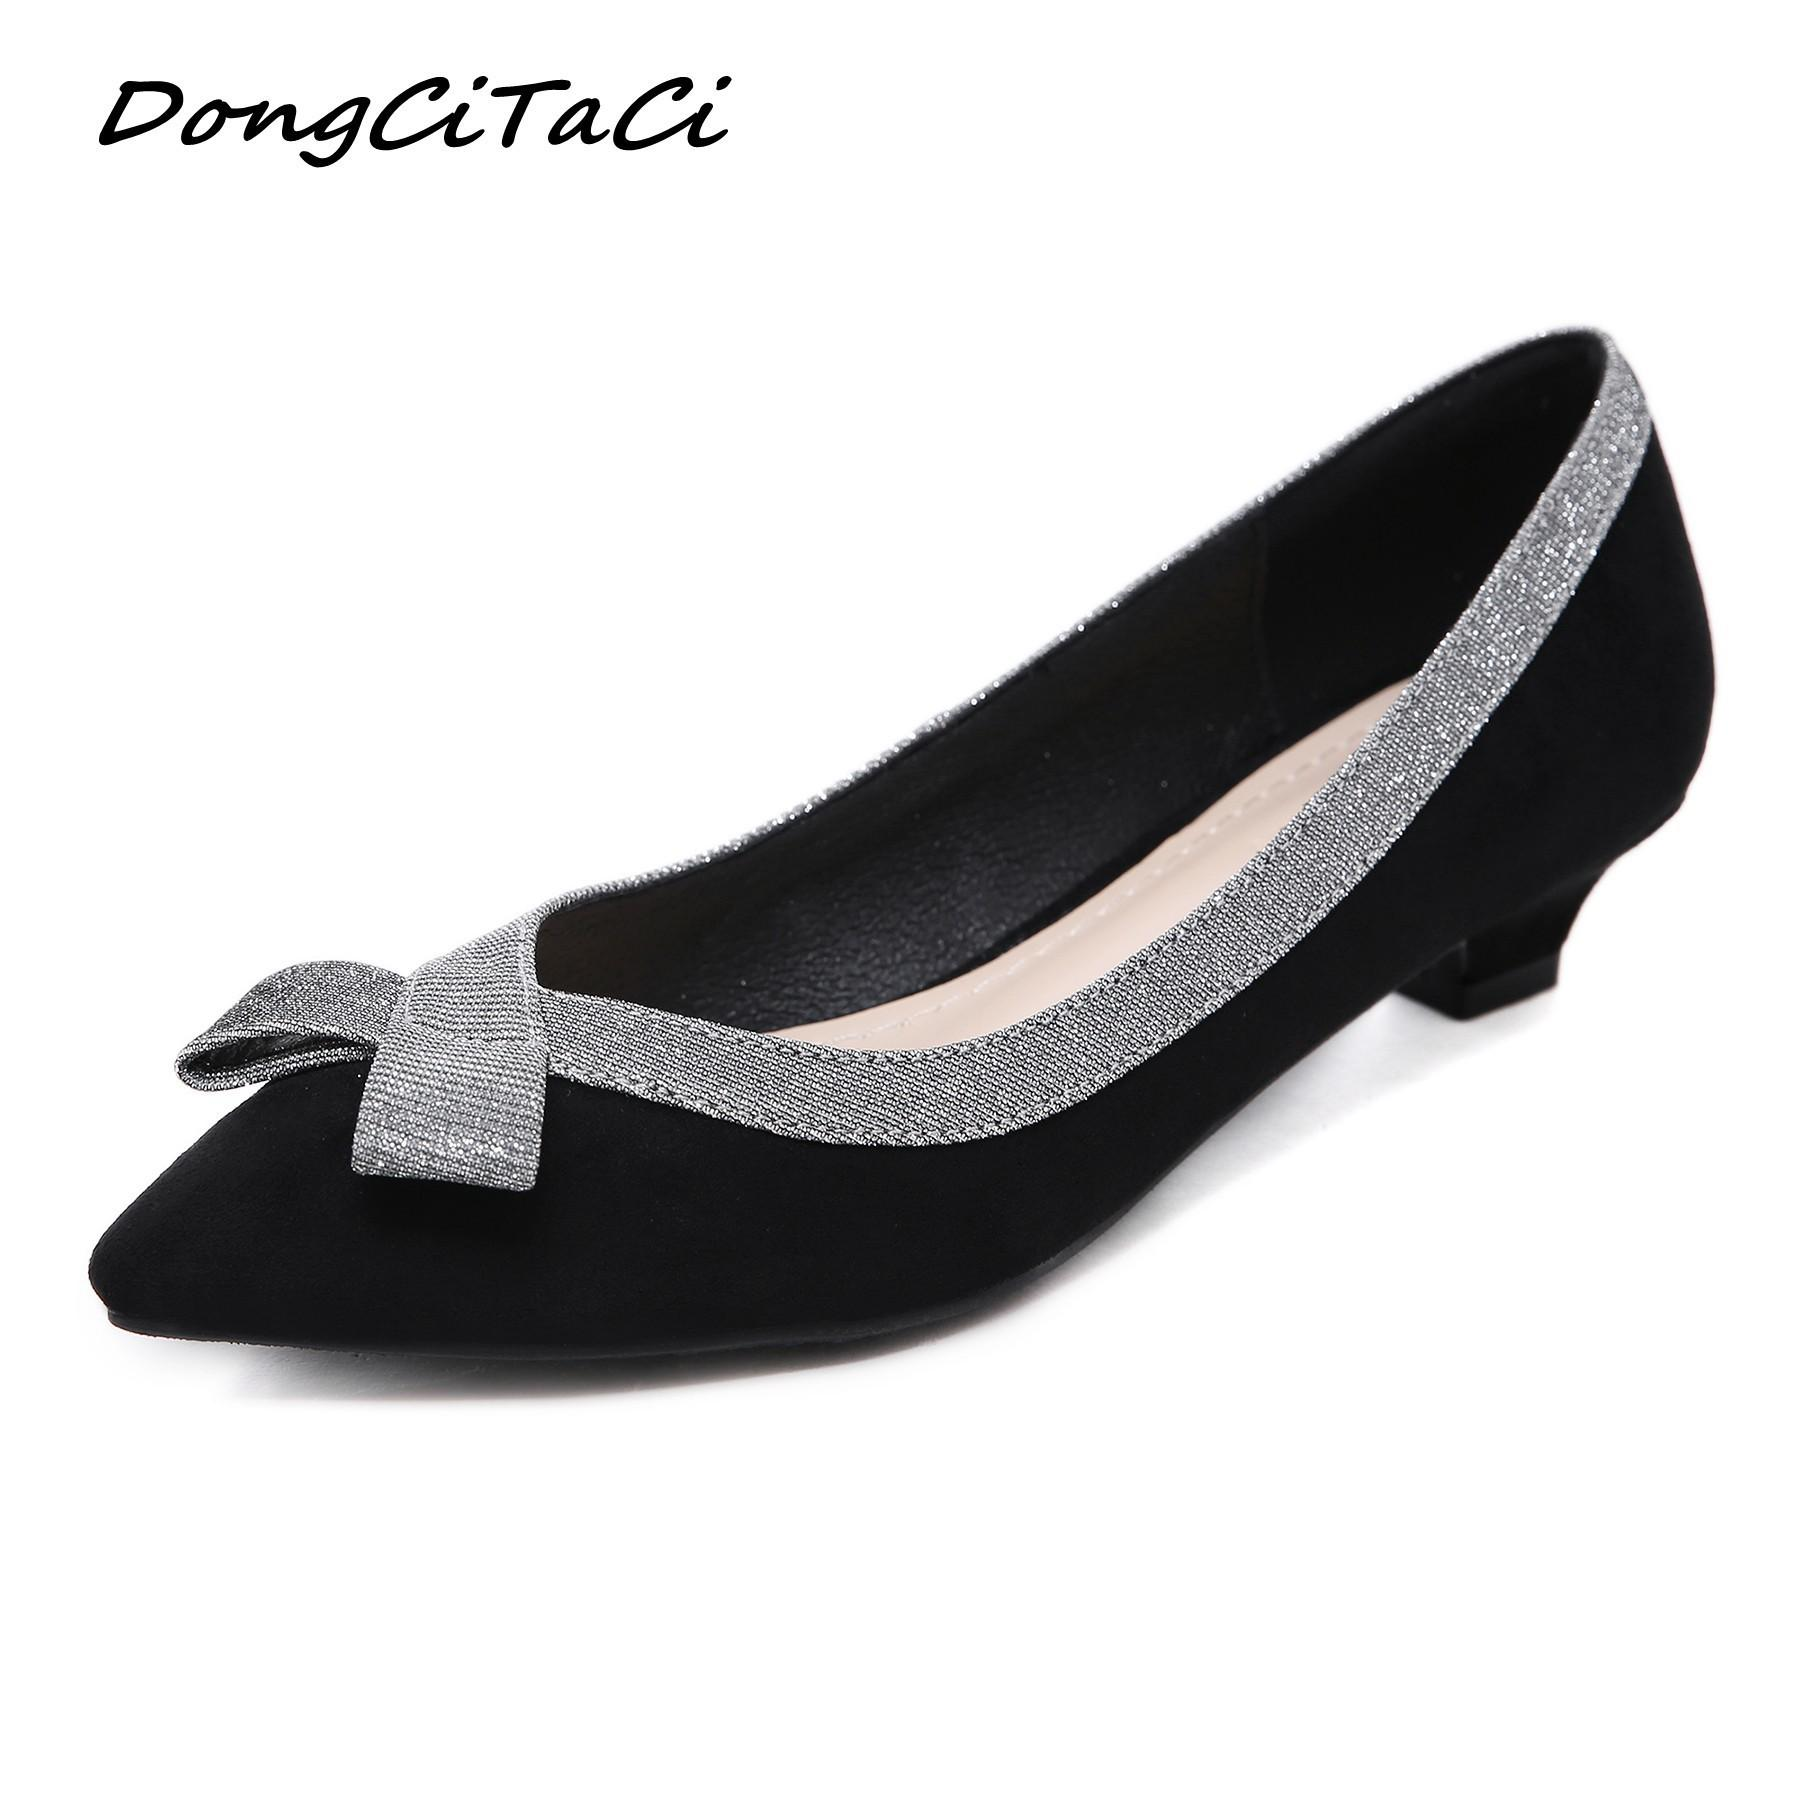 e0cdd93d78e Dress Shoes Dongcitaci 2019 Women Low Heels Woman Fashion Pointed Toe Retro  Bling Bowtie Lace Party Dress Ol Pumps Plus Size 35 42 Loafers For Women  Deck ...